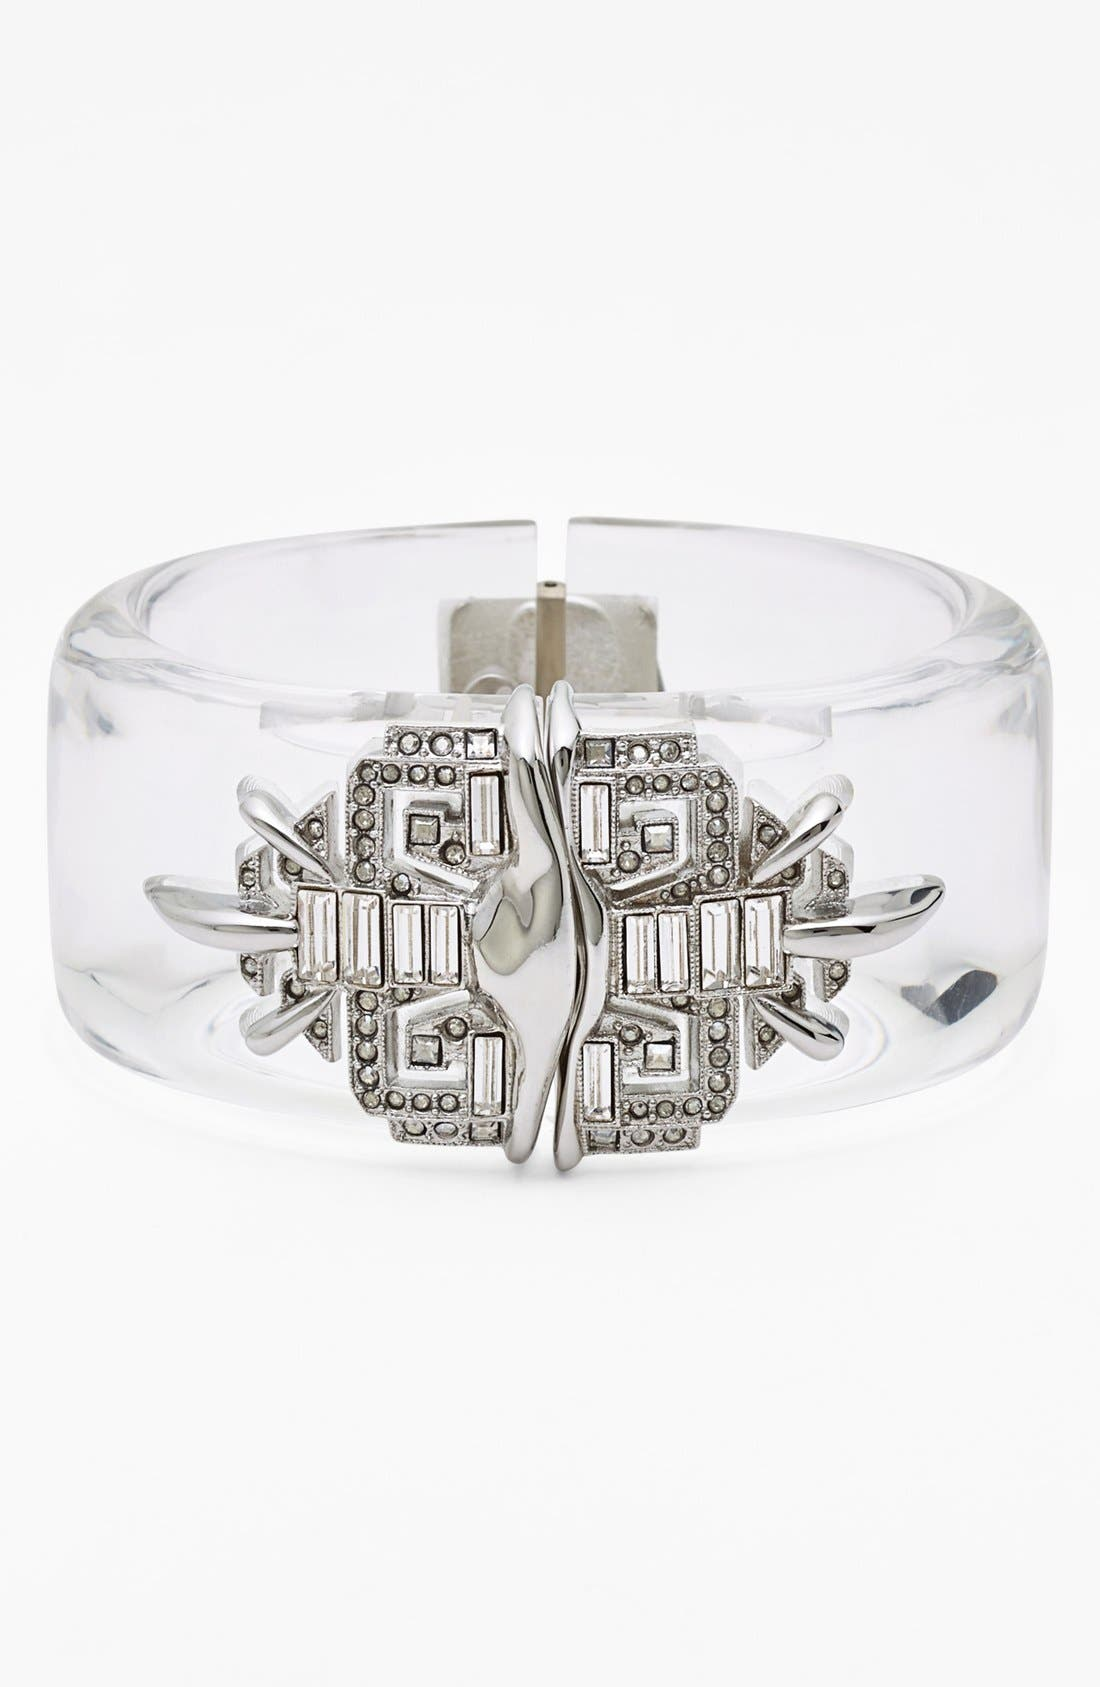 Main Image - Alexis Bittar 'Lucite® - Winter Deco' Hinged Bracelet